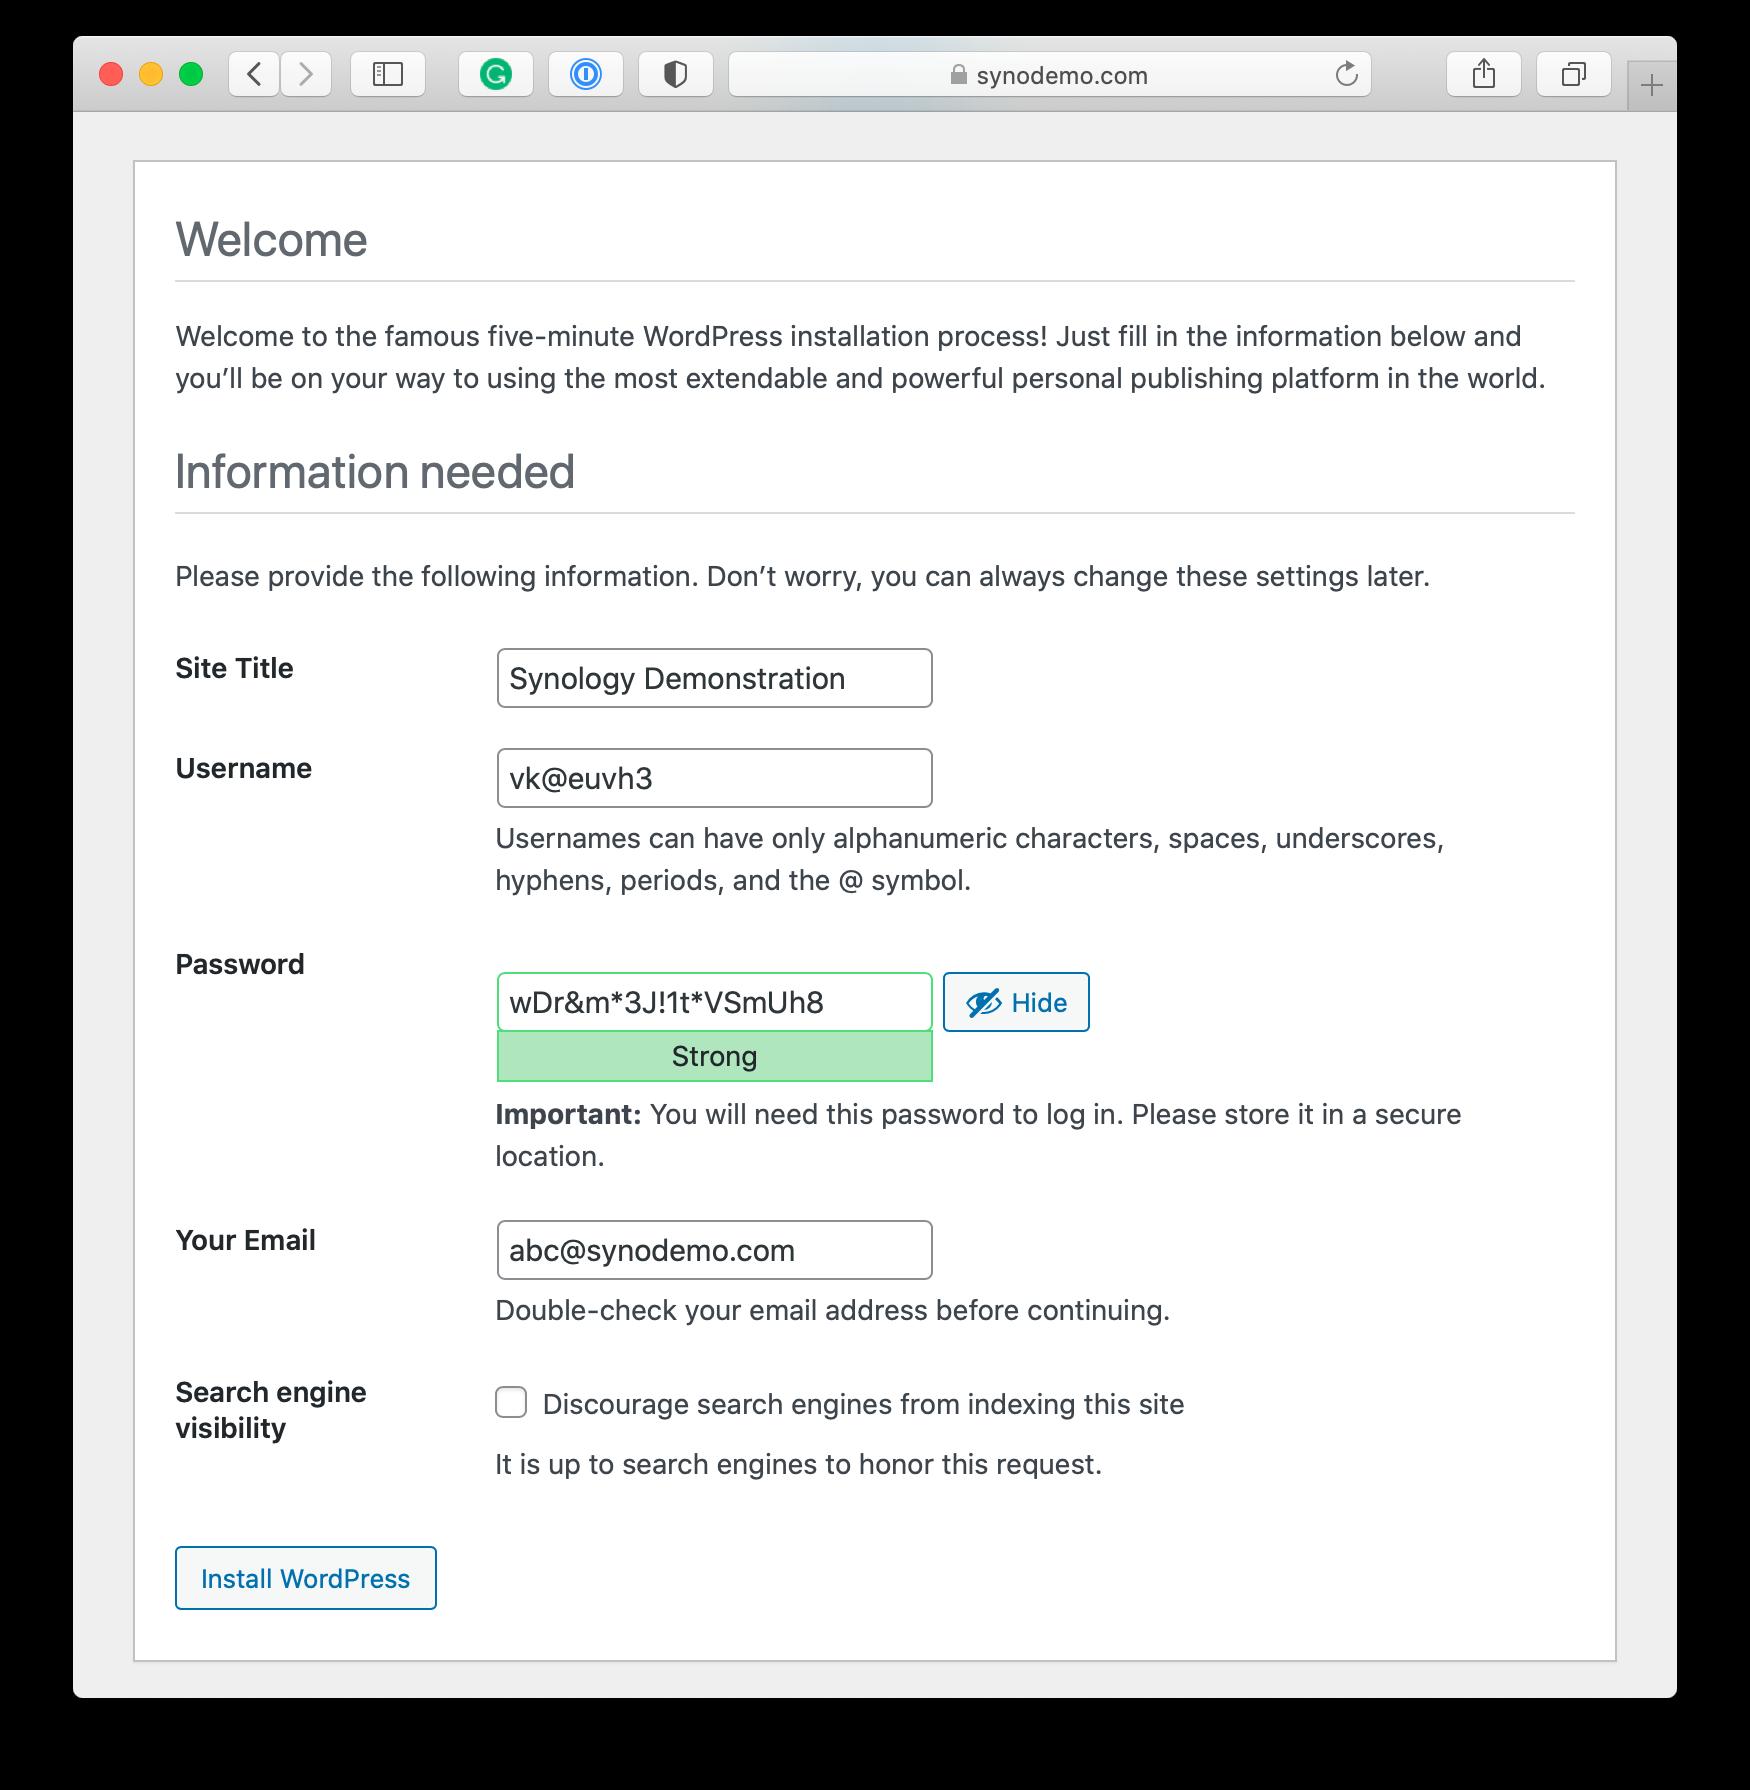 wordpress, installer, 5 minutes